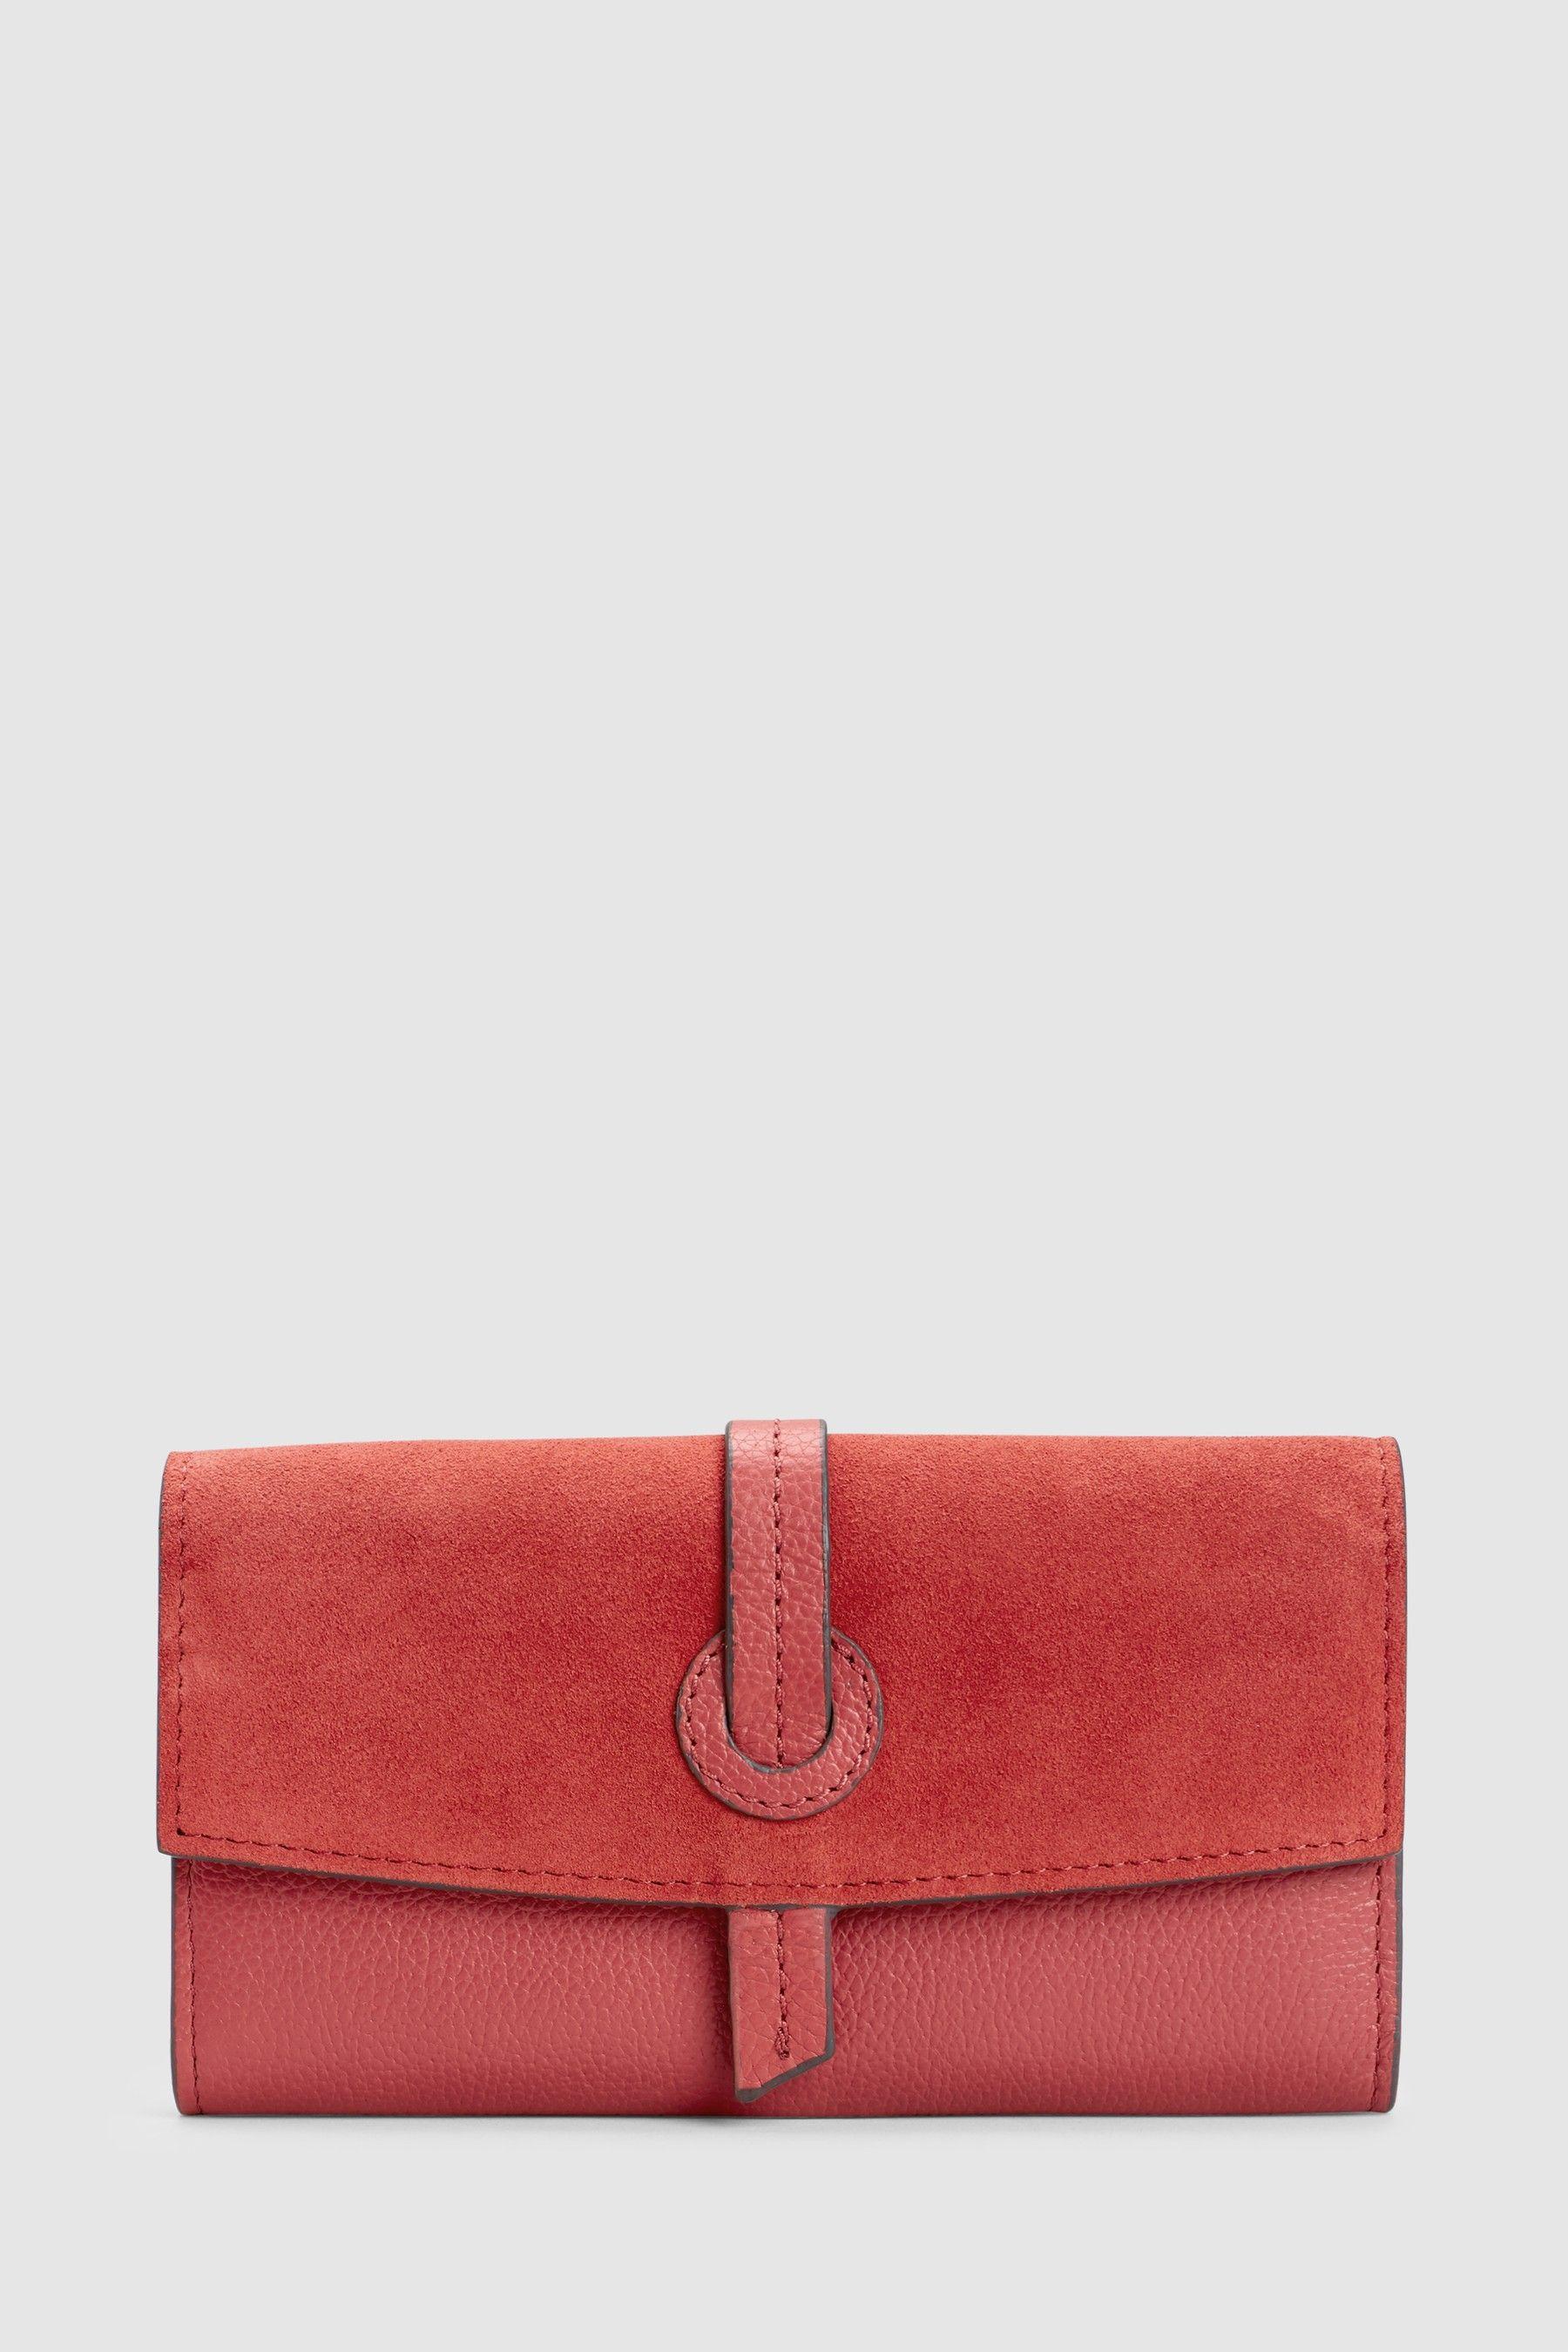 74a525e27e9e Womens Next Raspberry Leather Fold-Over Purse - Pink  pursesnext ...